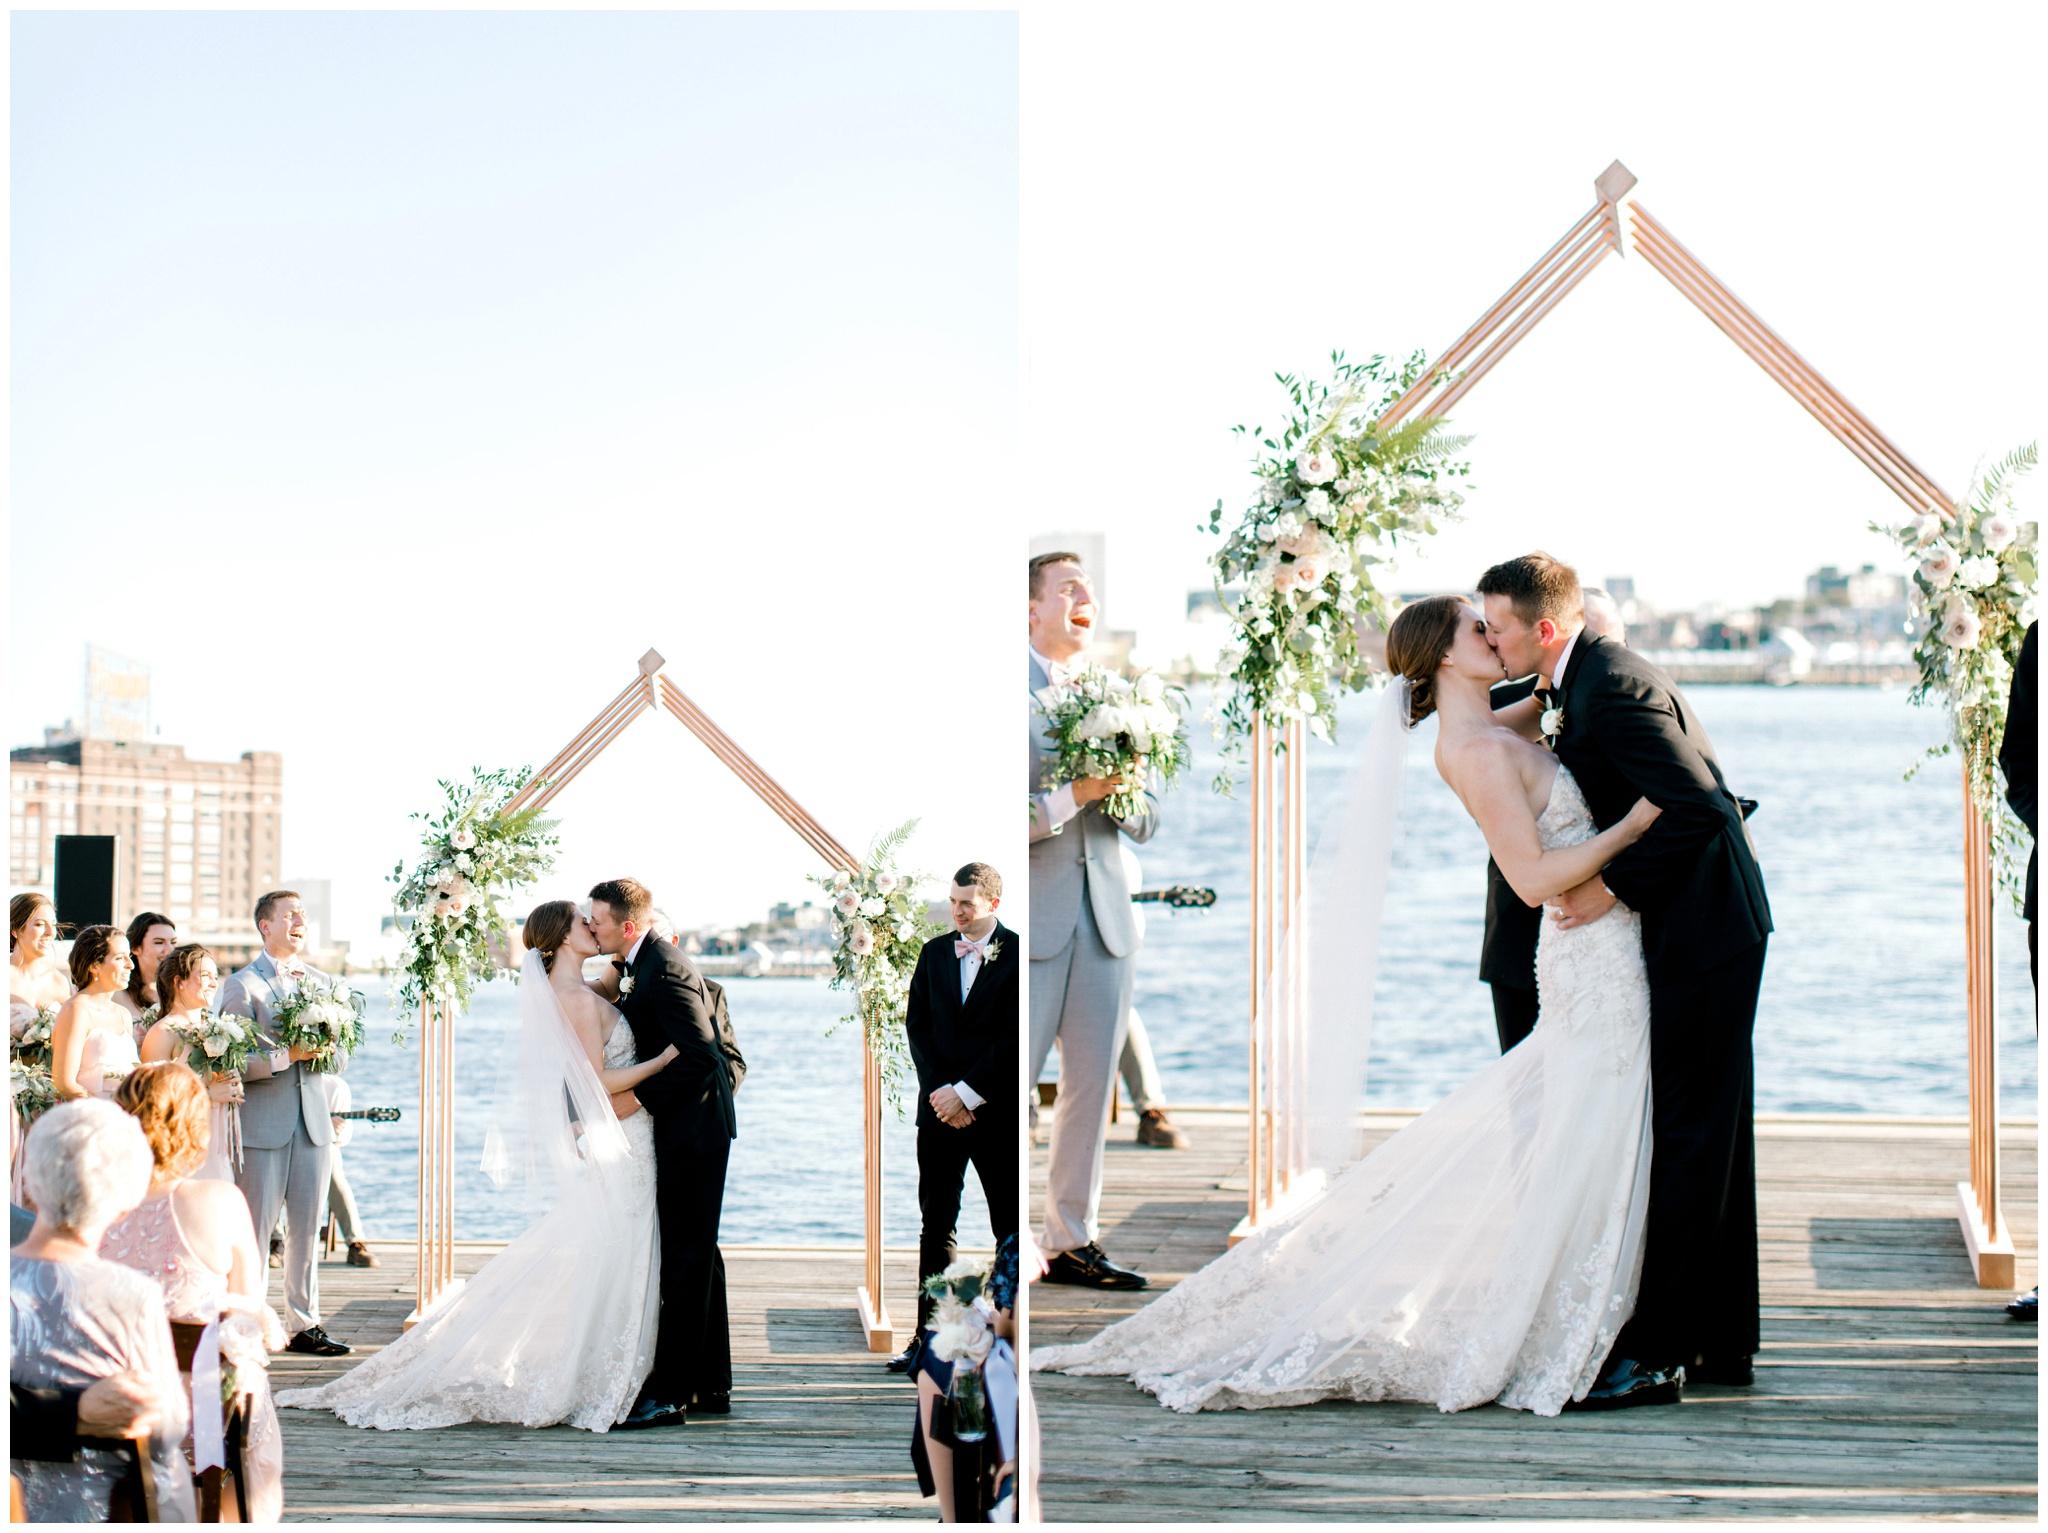 Frederick Douglass-Issac Myers Maritime Park Wedding